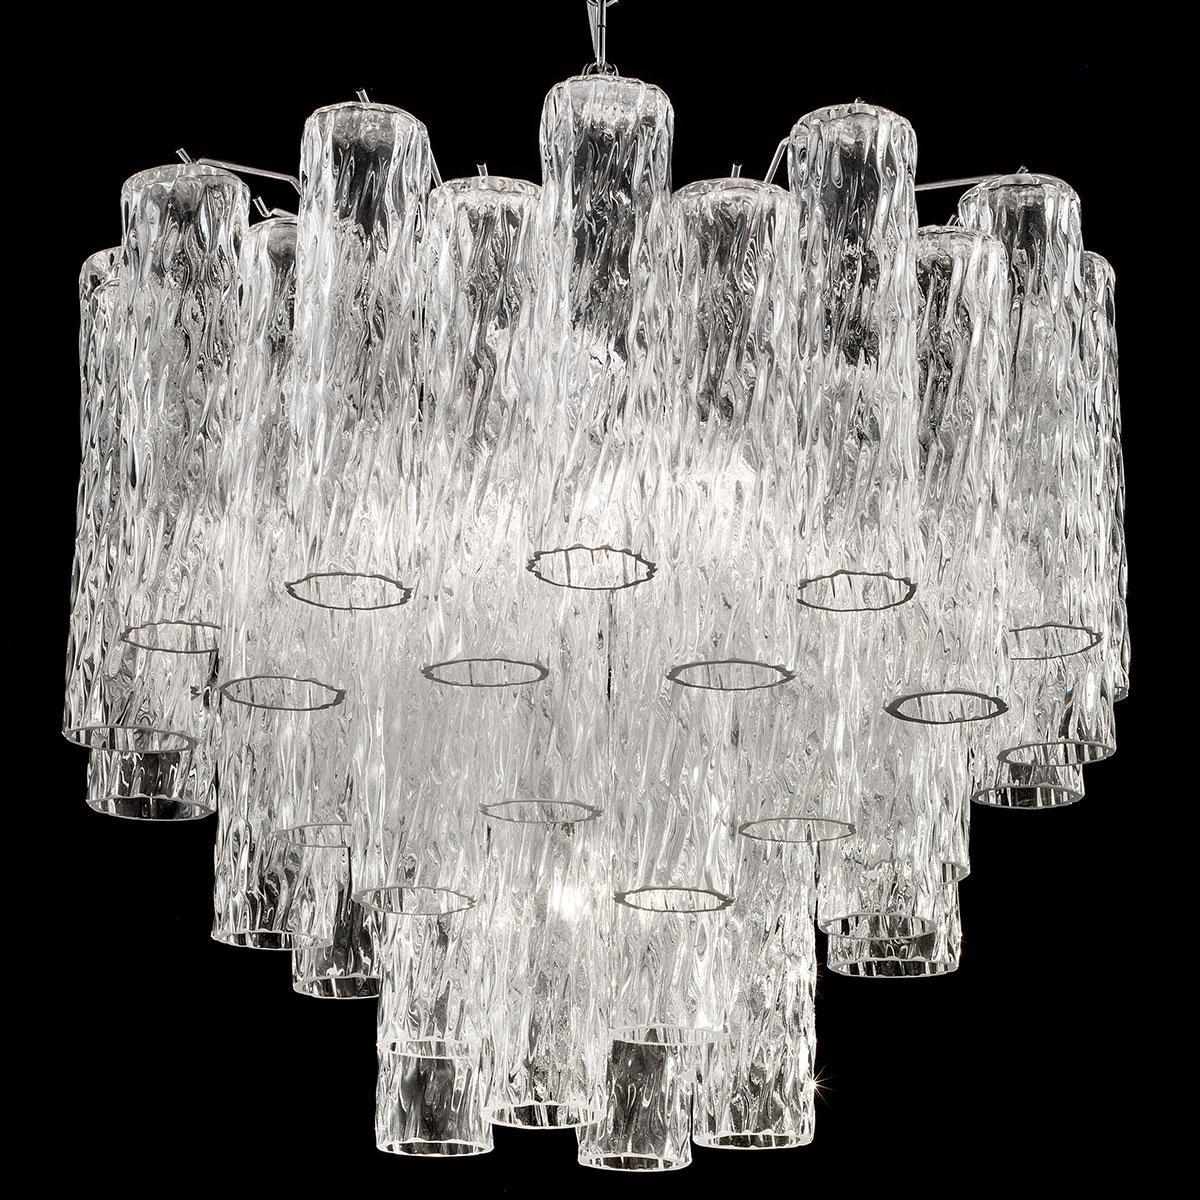 """Tronchi"" araña grande de cristal de Murano - 7 luces - transparente y cromo"